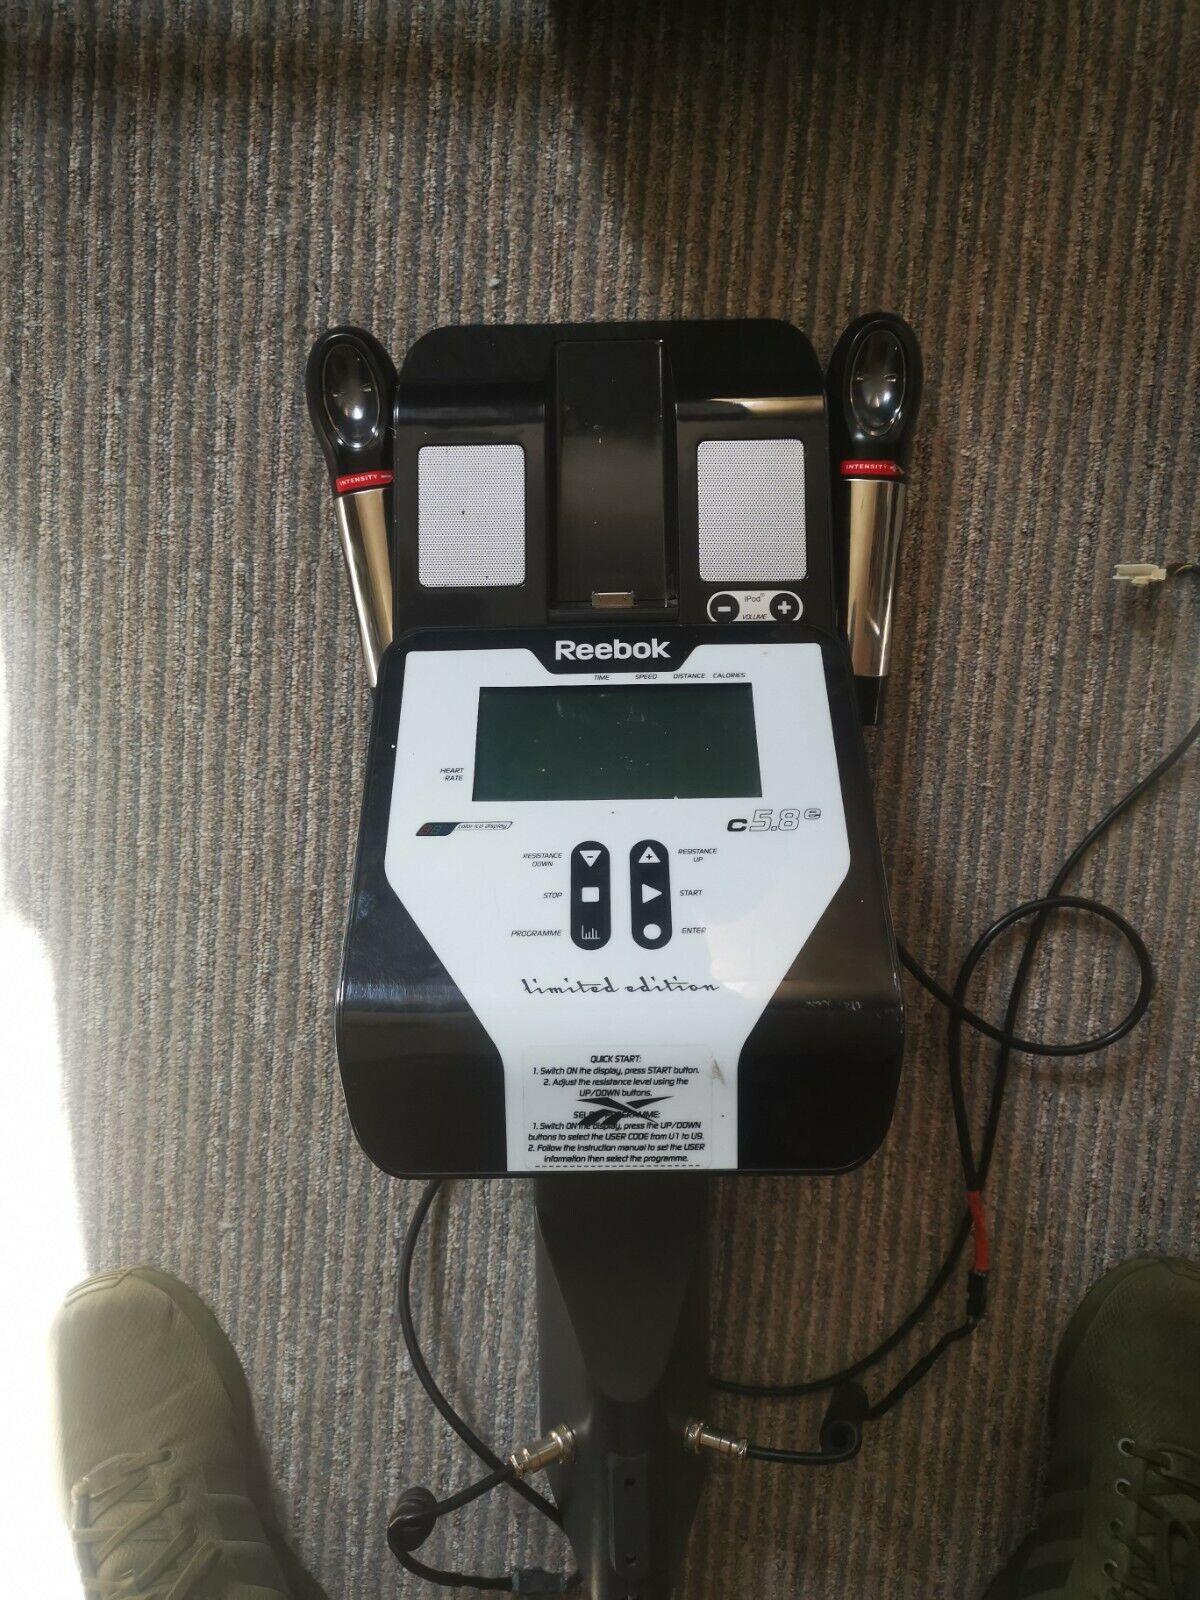 campo Andrew Halliday Instituto  Reebok C5.8e Le Elliptical Cross Trainer for sale   eBay